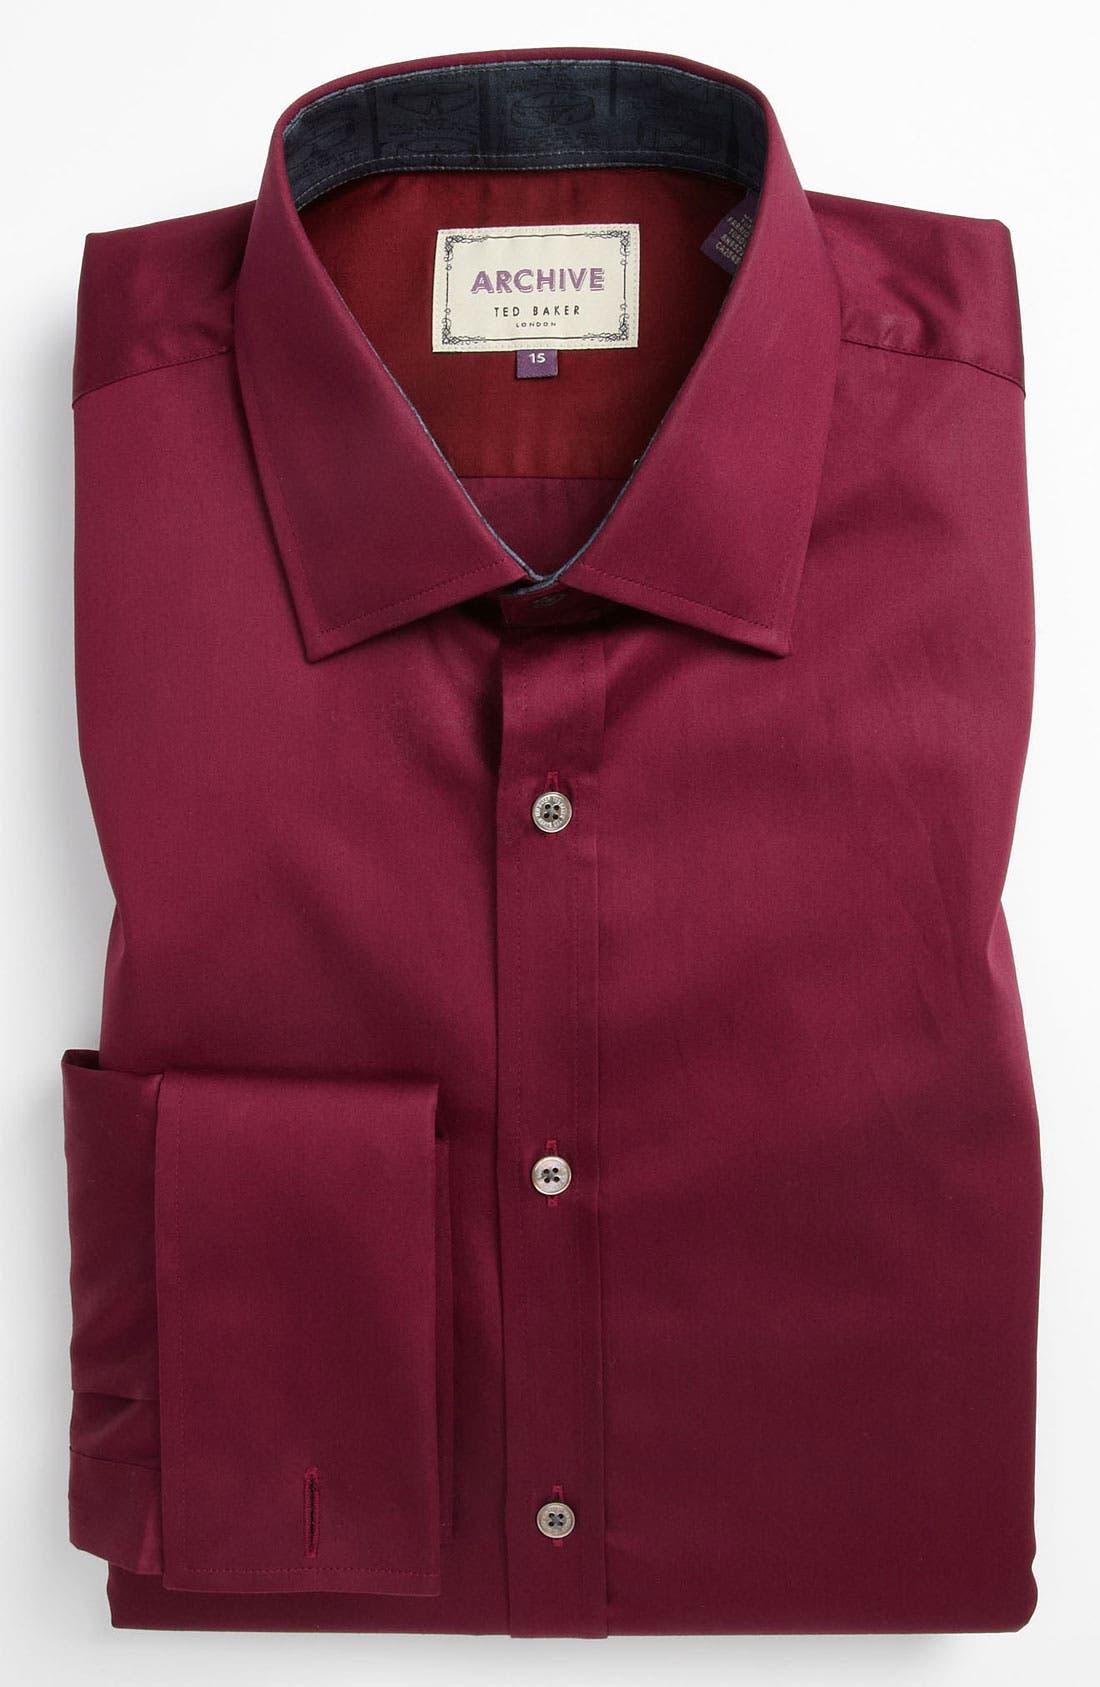 Main Image - Ted Baker London Trim Fit Dress Shirt